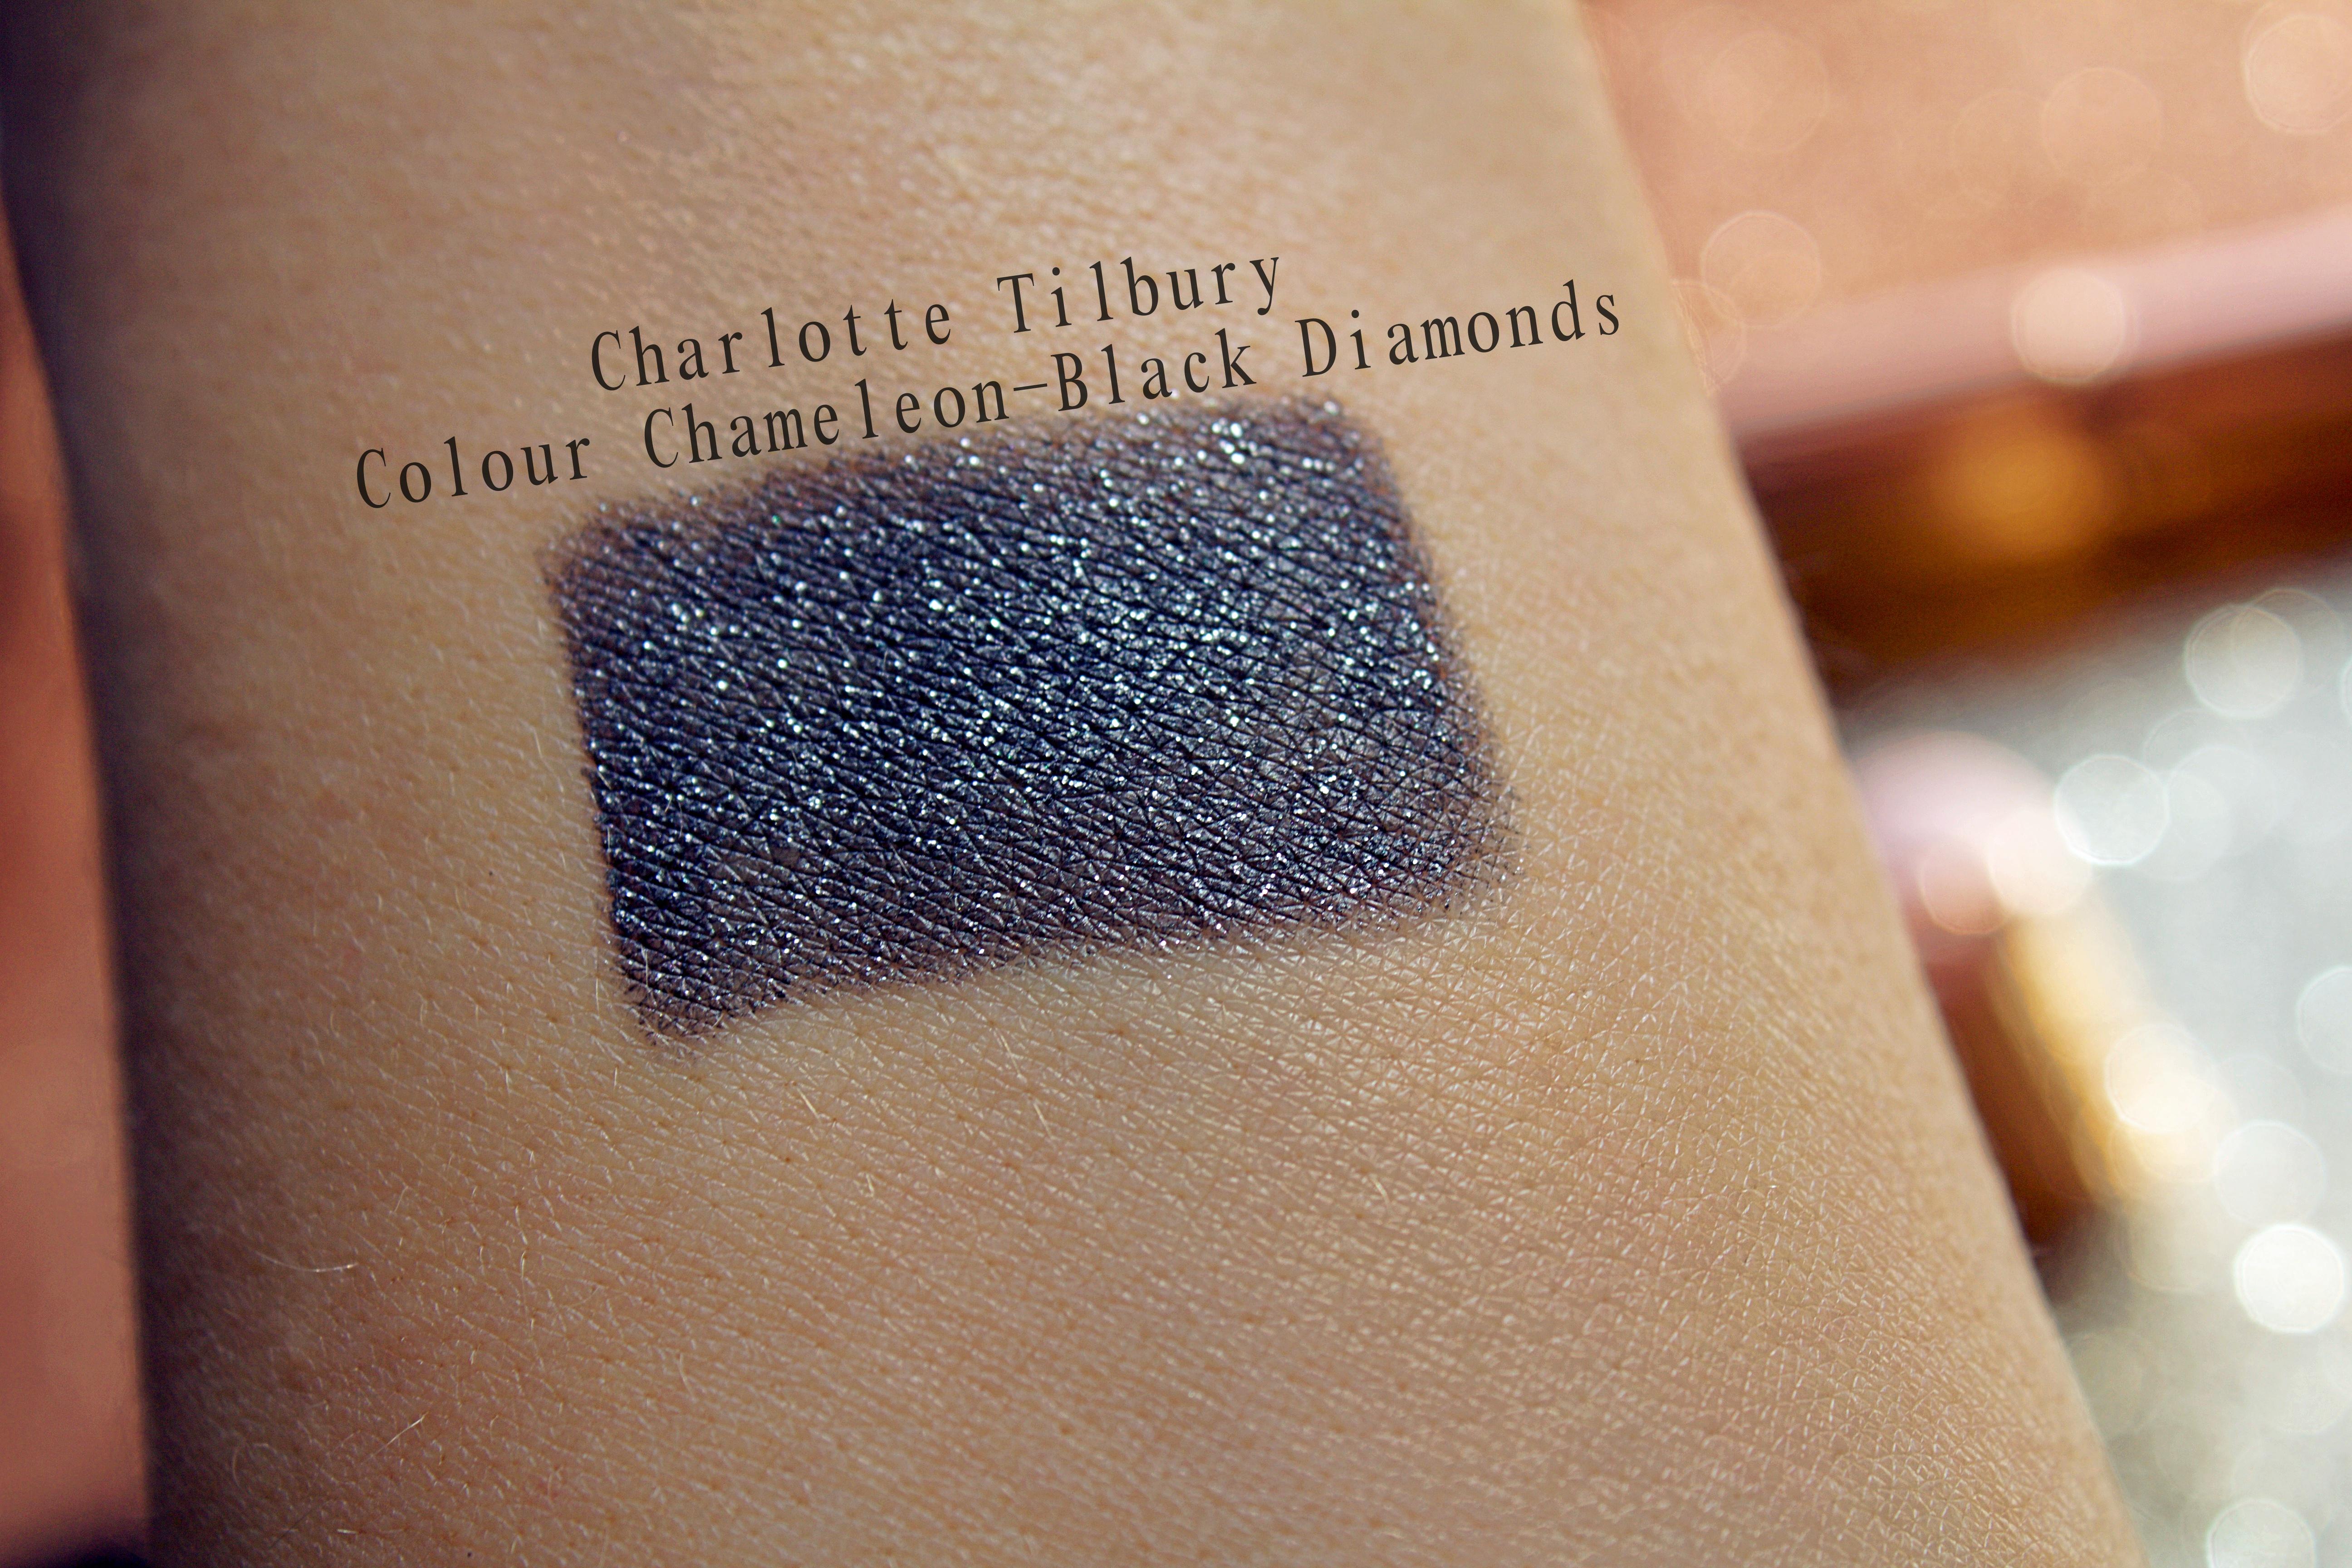 Charlotte- Tilbury- Colour-Chameleon-Black-Diamonds-eyeshadow-crayon